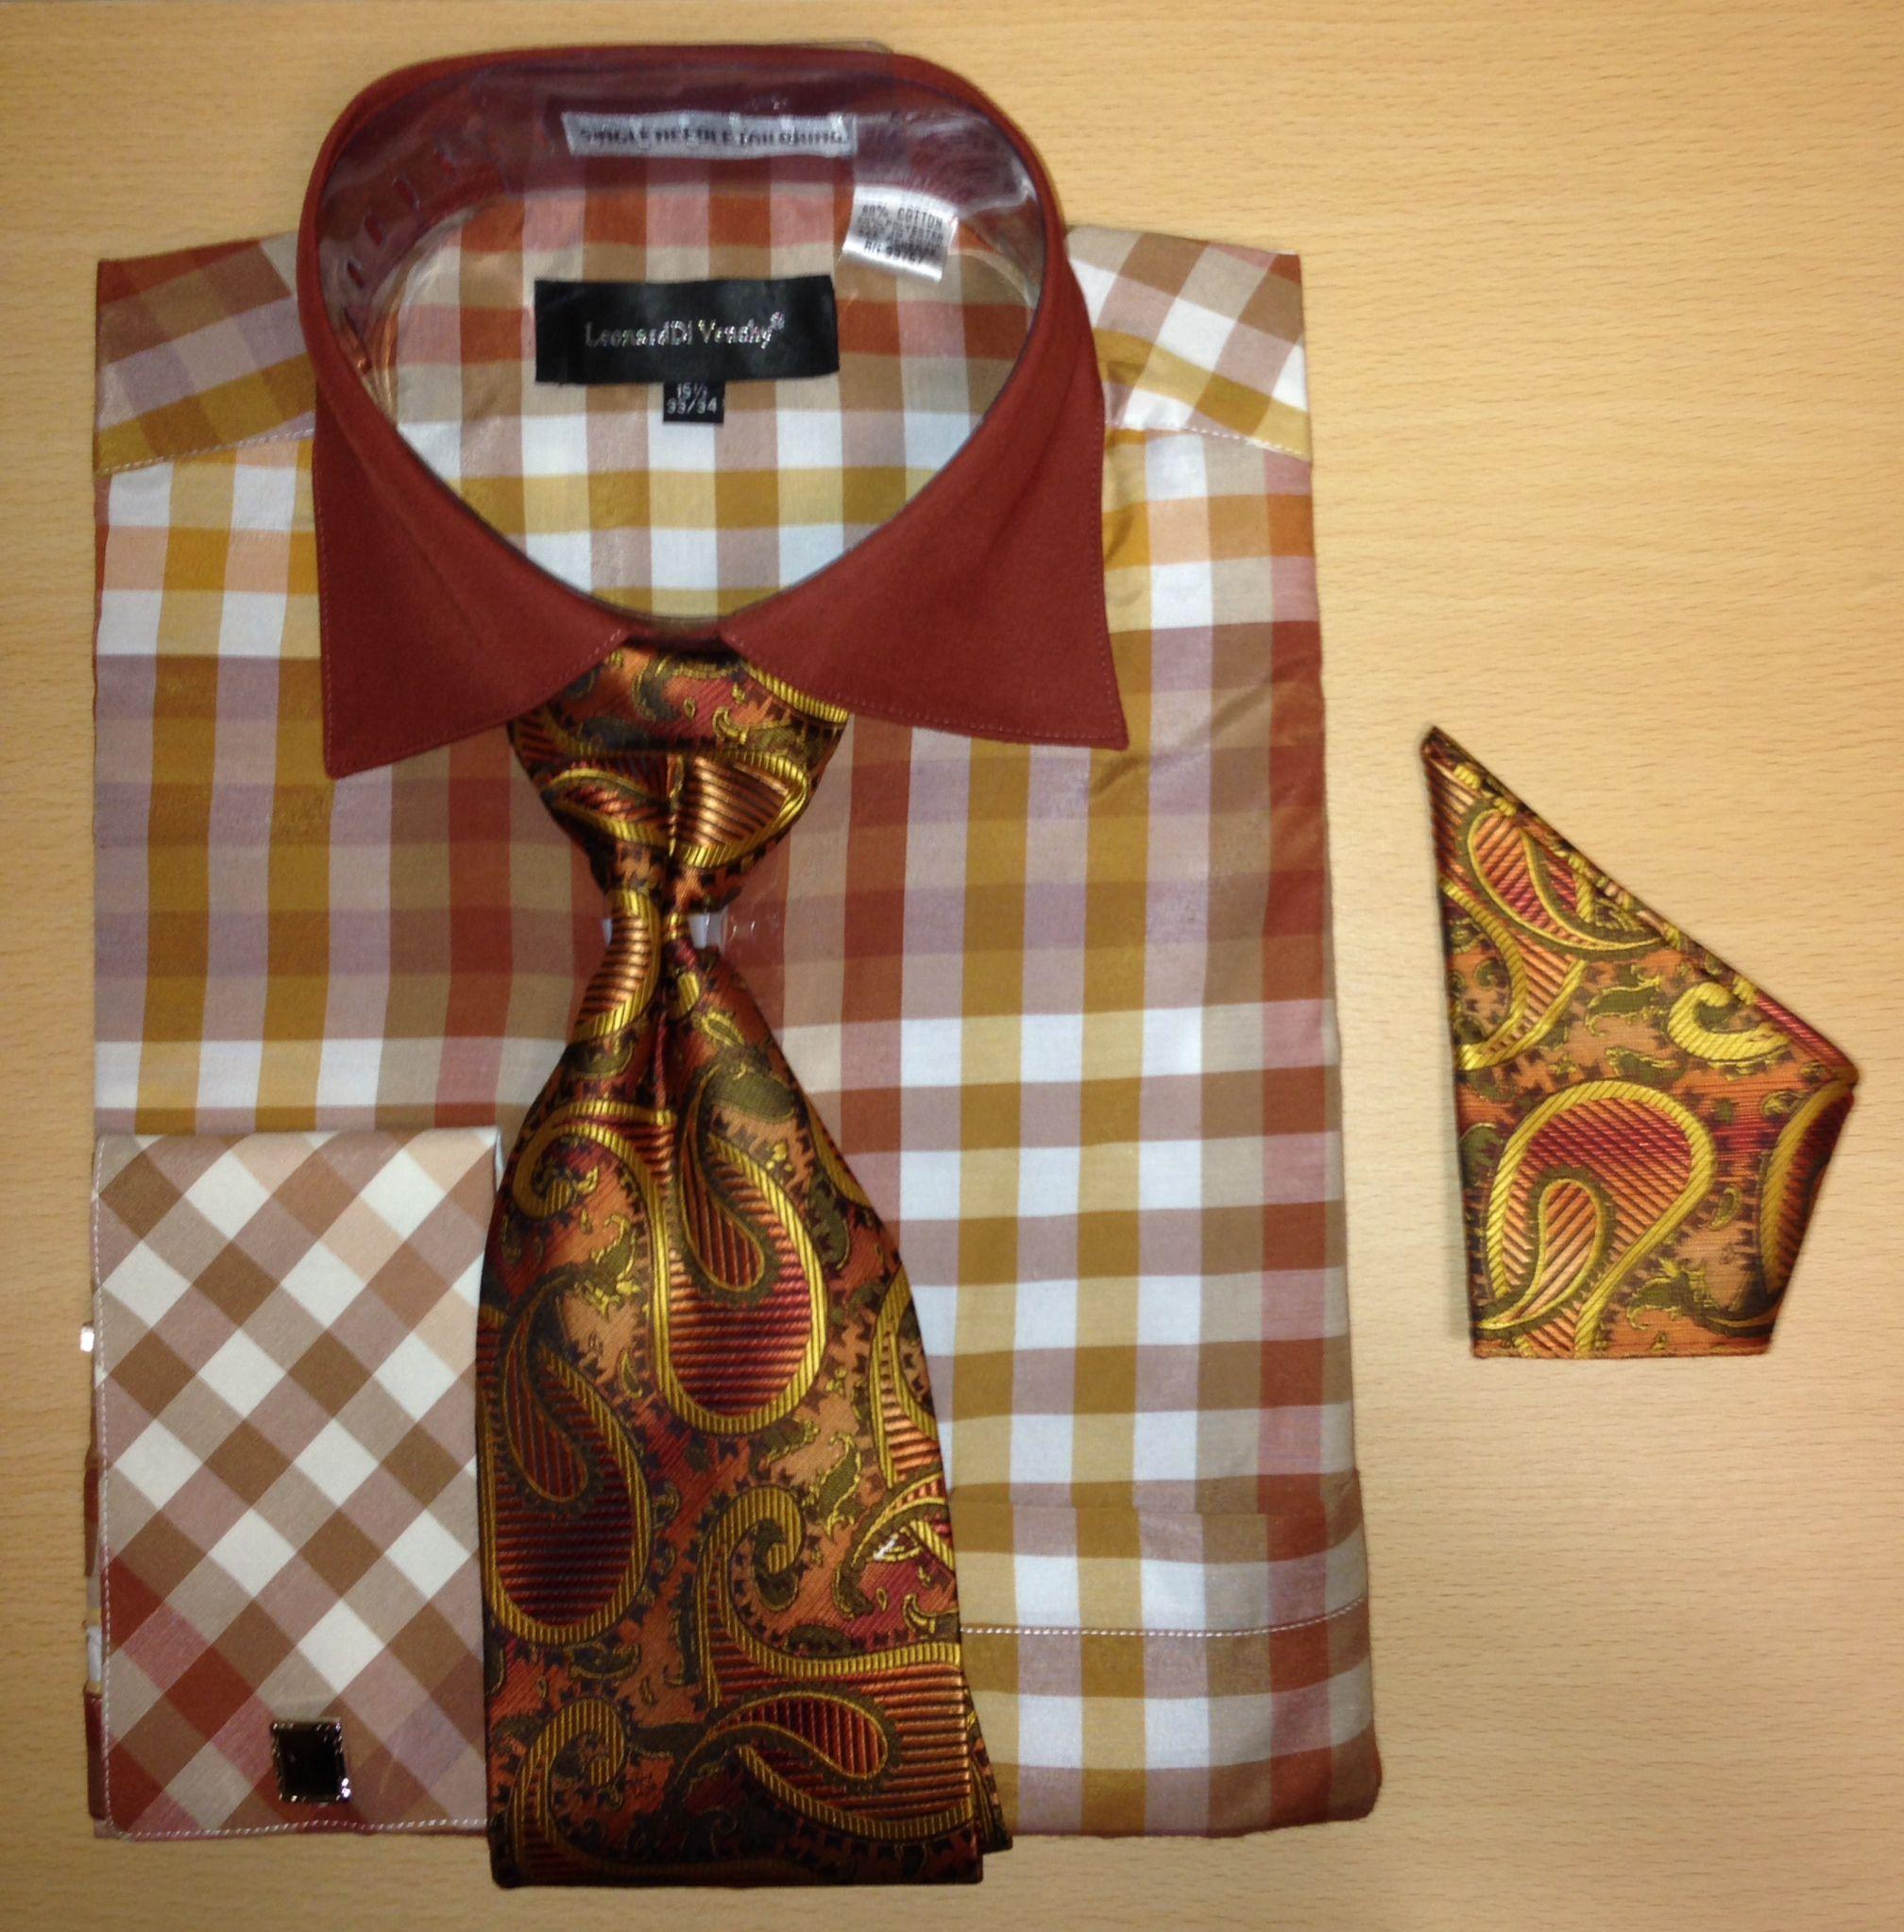 Men's Fashion Multi Gingham Checked Cufflink Dress Shirt Set - Brown